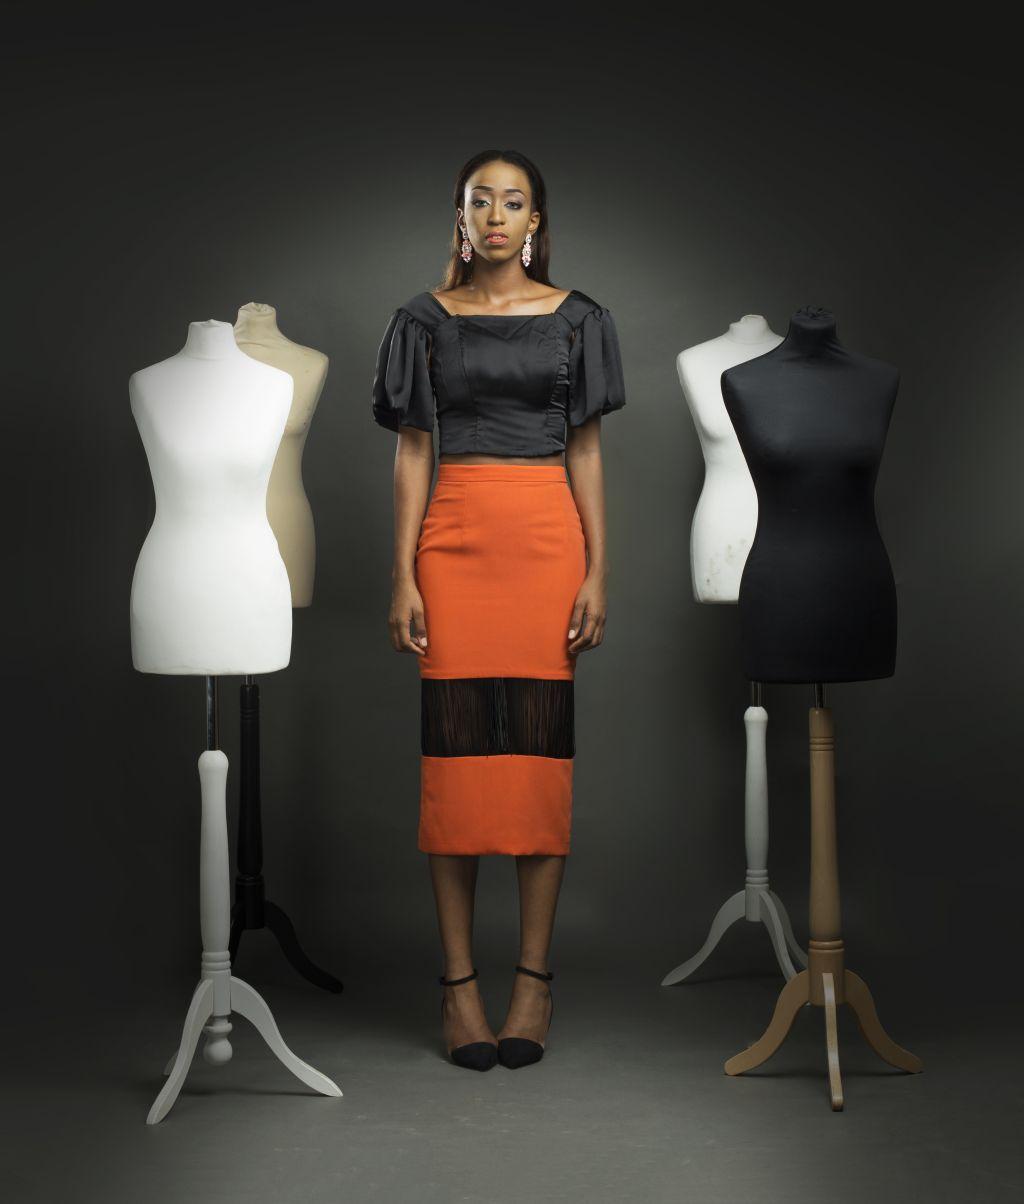 Nuraniya Ready To Wear 2015 Philosophy Collection - BellaNaija - March 2015002